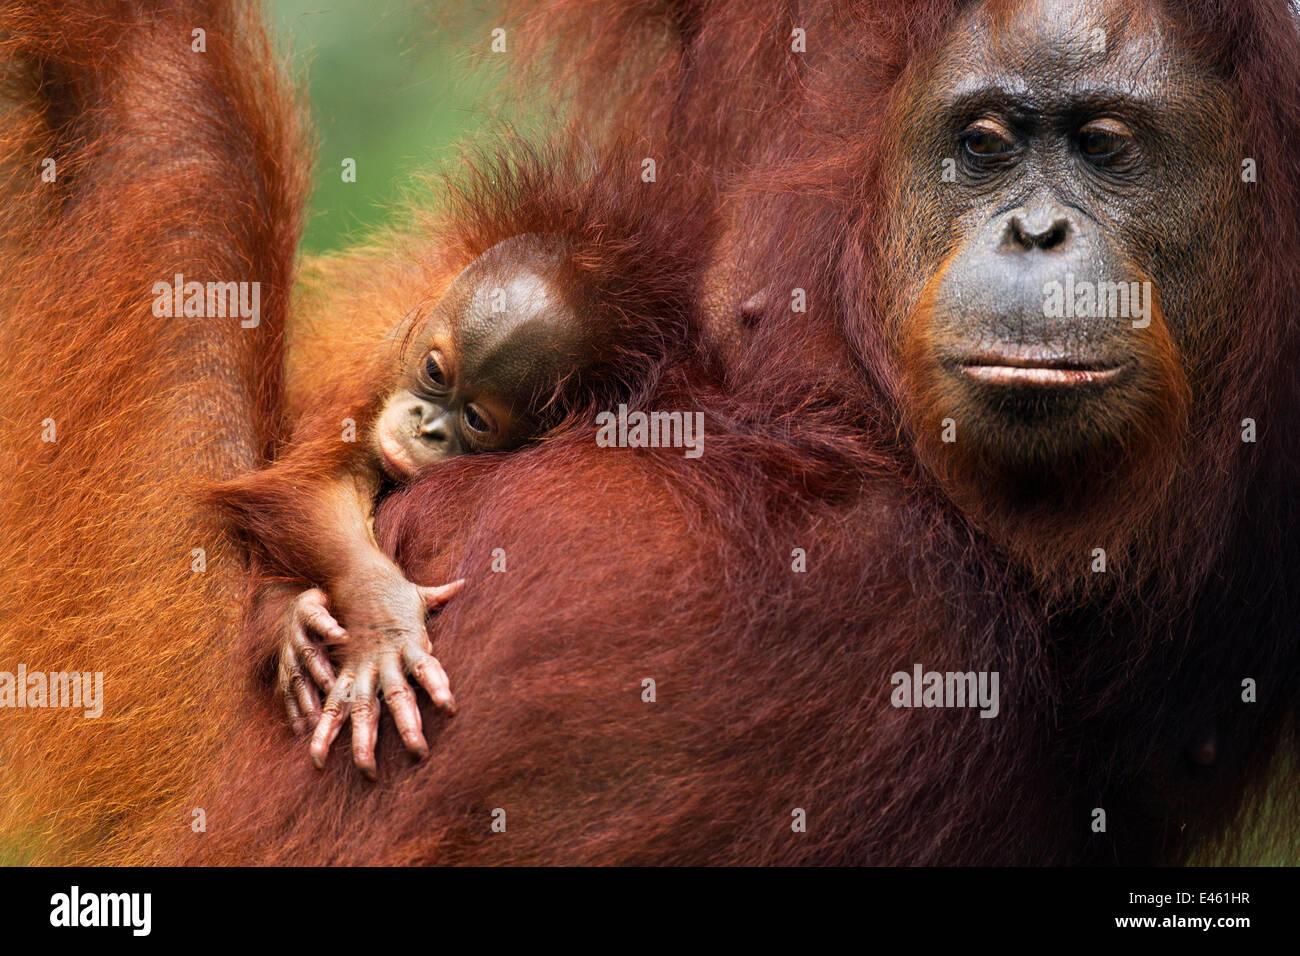 Bornean Orangutan (Pongo pygmaeus wurmbii) female 'Tata' and her unnamed baby aged 2-3 months portrait. - Stock Image